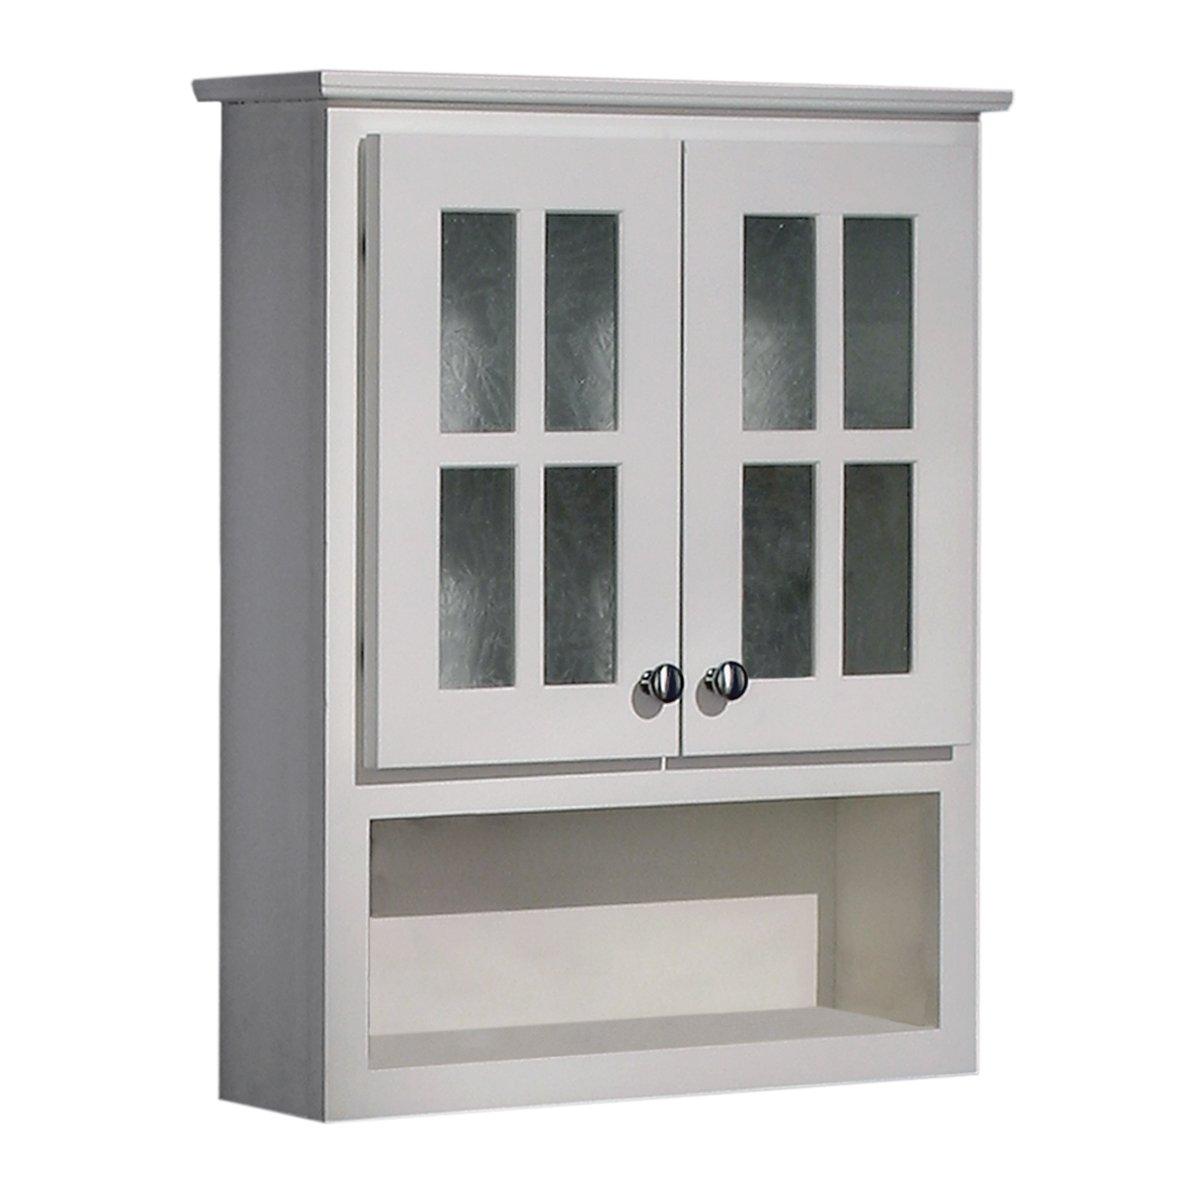 Cabinet kitchen furniture maple china bathroom cabinet cabinet - Amazon Com Coastal Collection Coj 249 Cape Cod Series Maple With White Finish Mullion Overjohn Cabinet